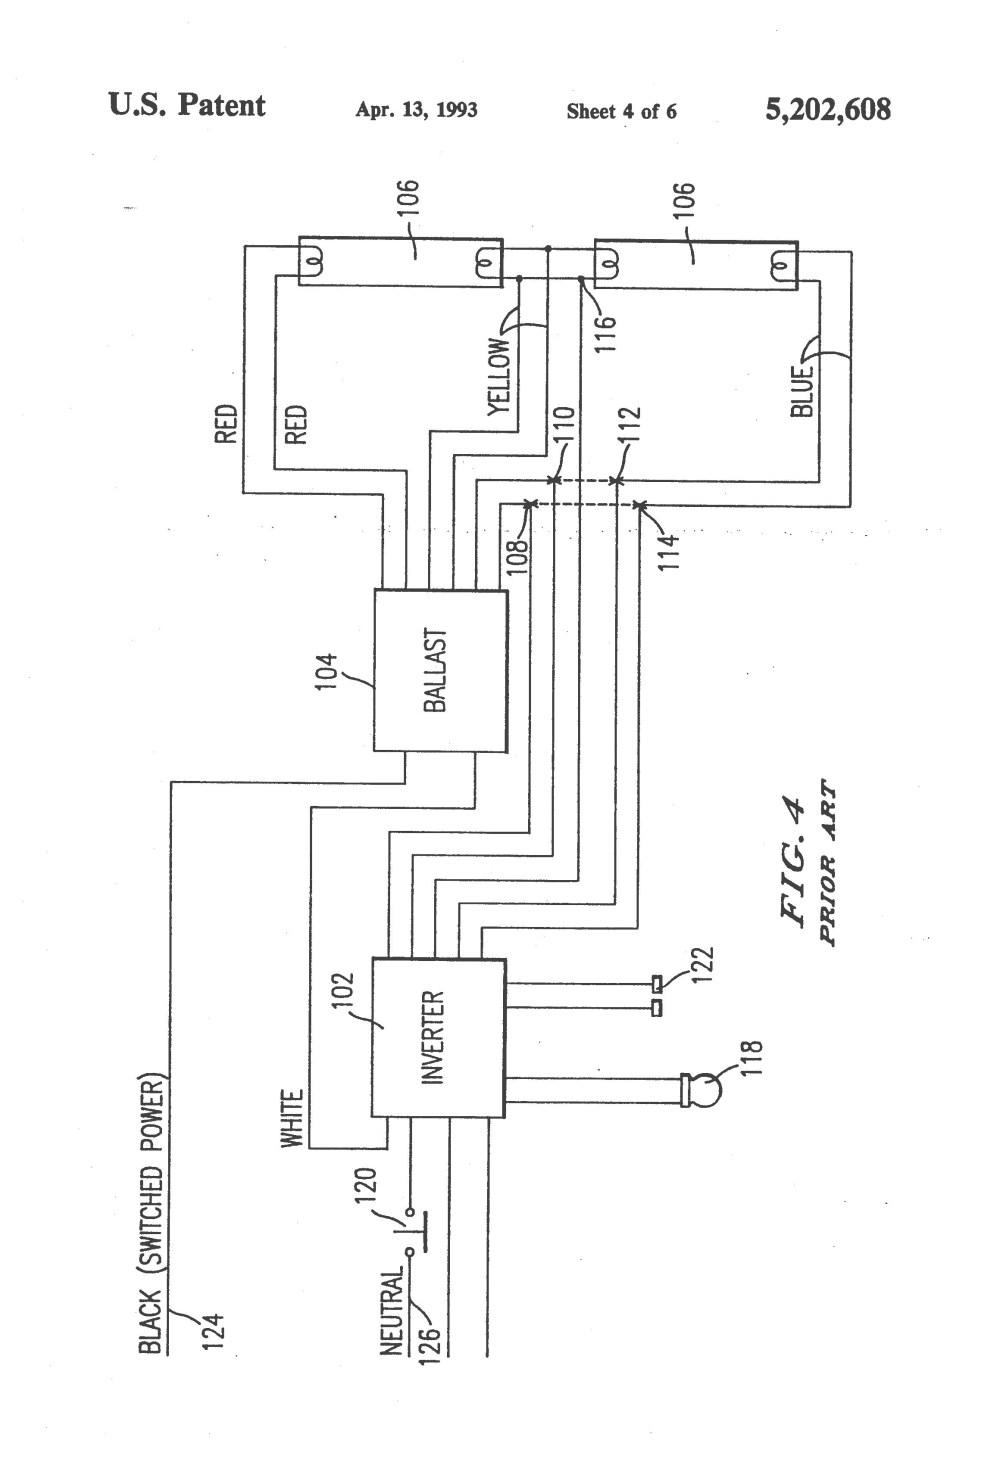 medium resolution of sign ballast wiring diagram wiring diagram for fluorescent lights top rated lamp ballast wiring diagram